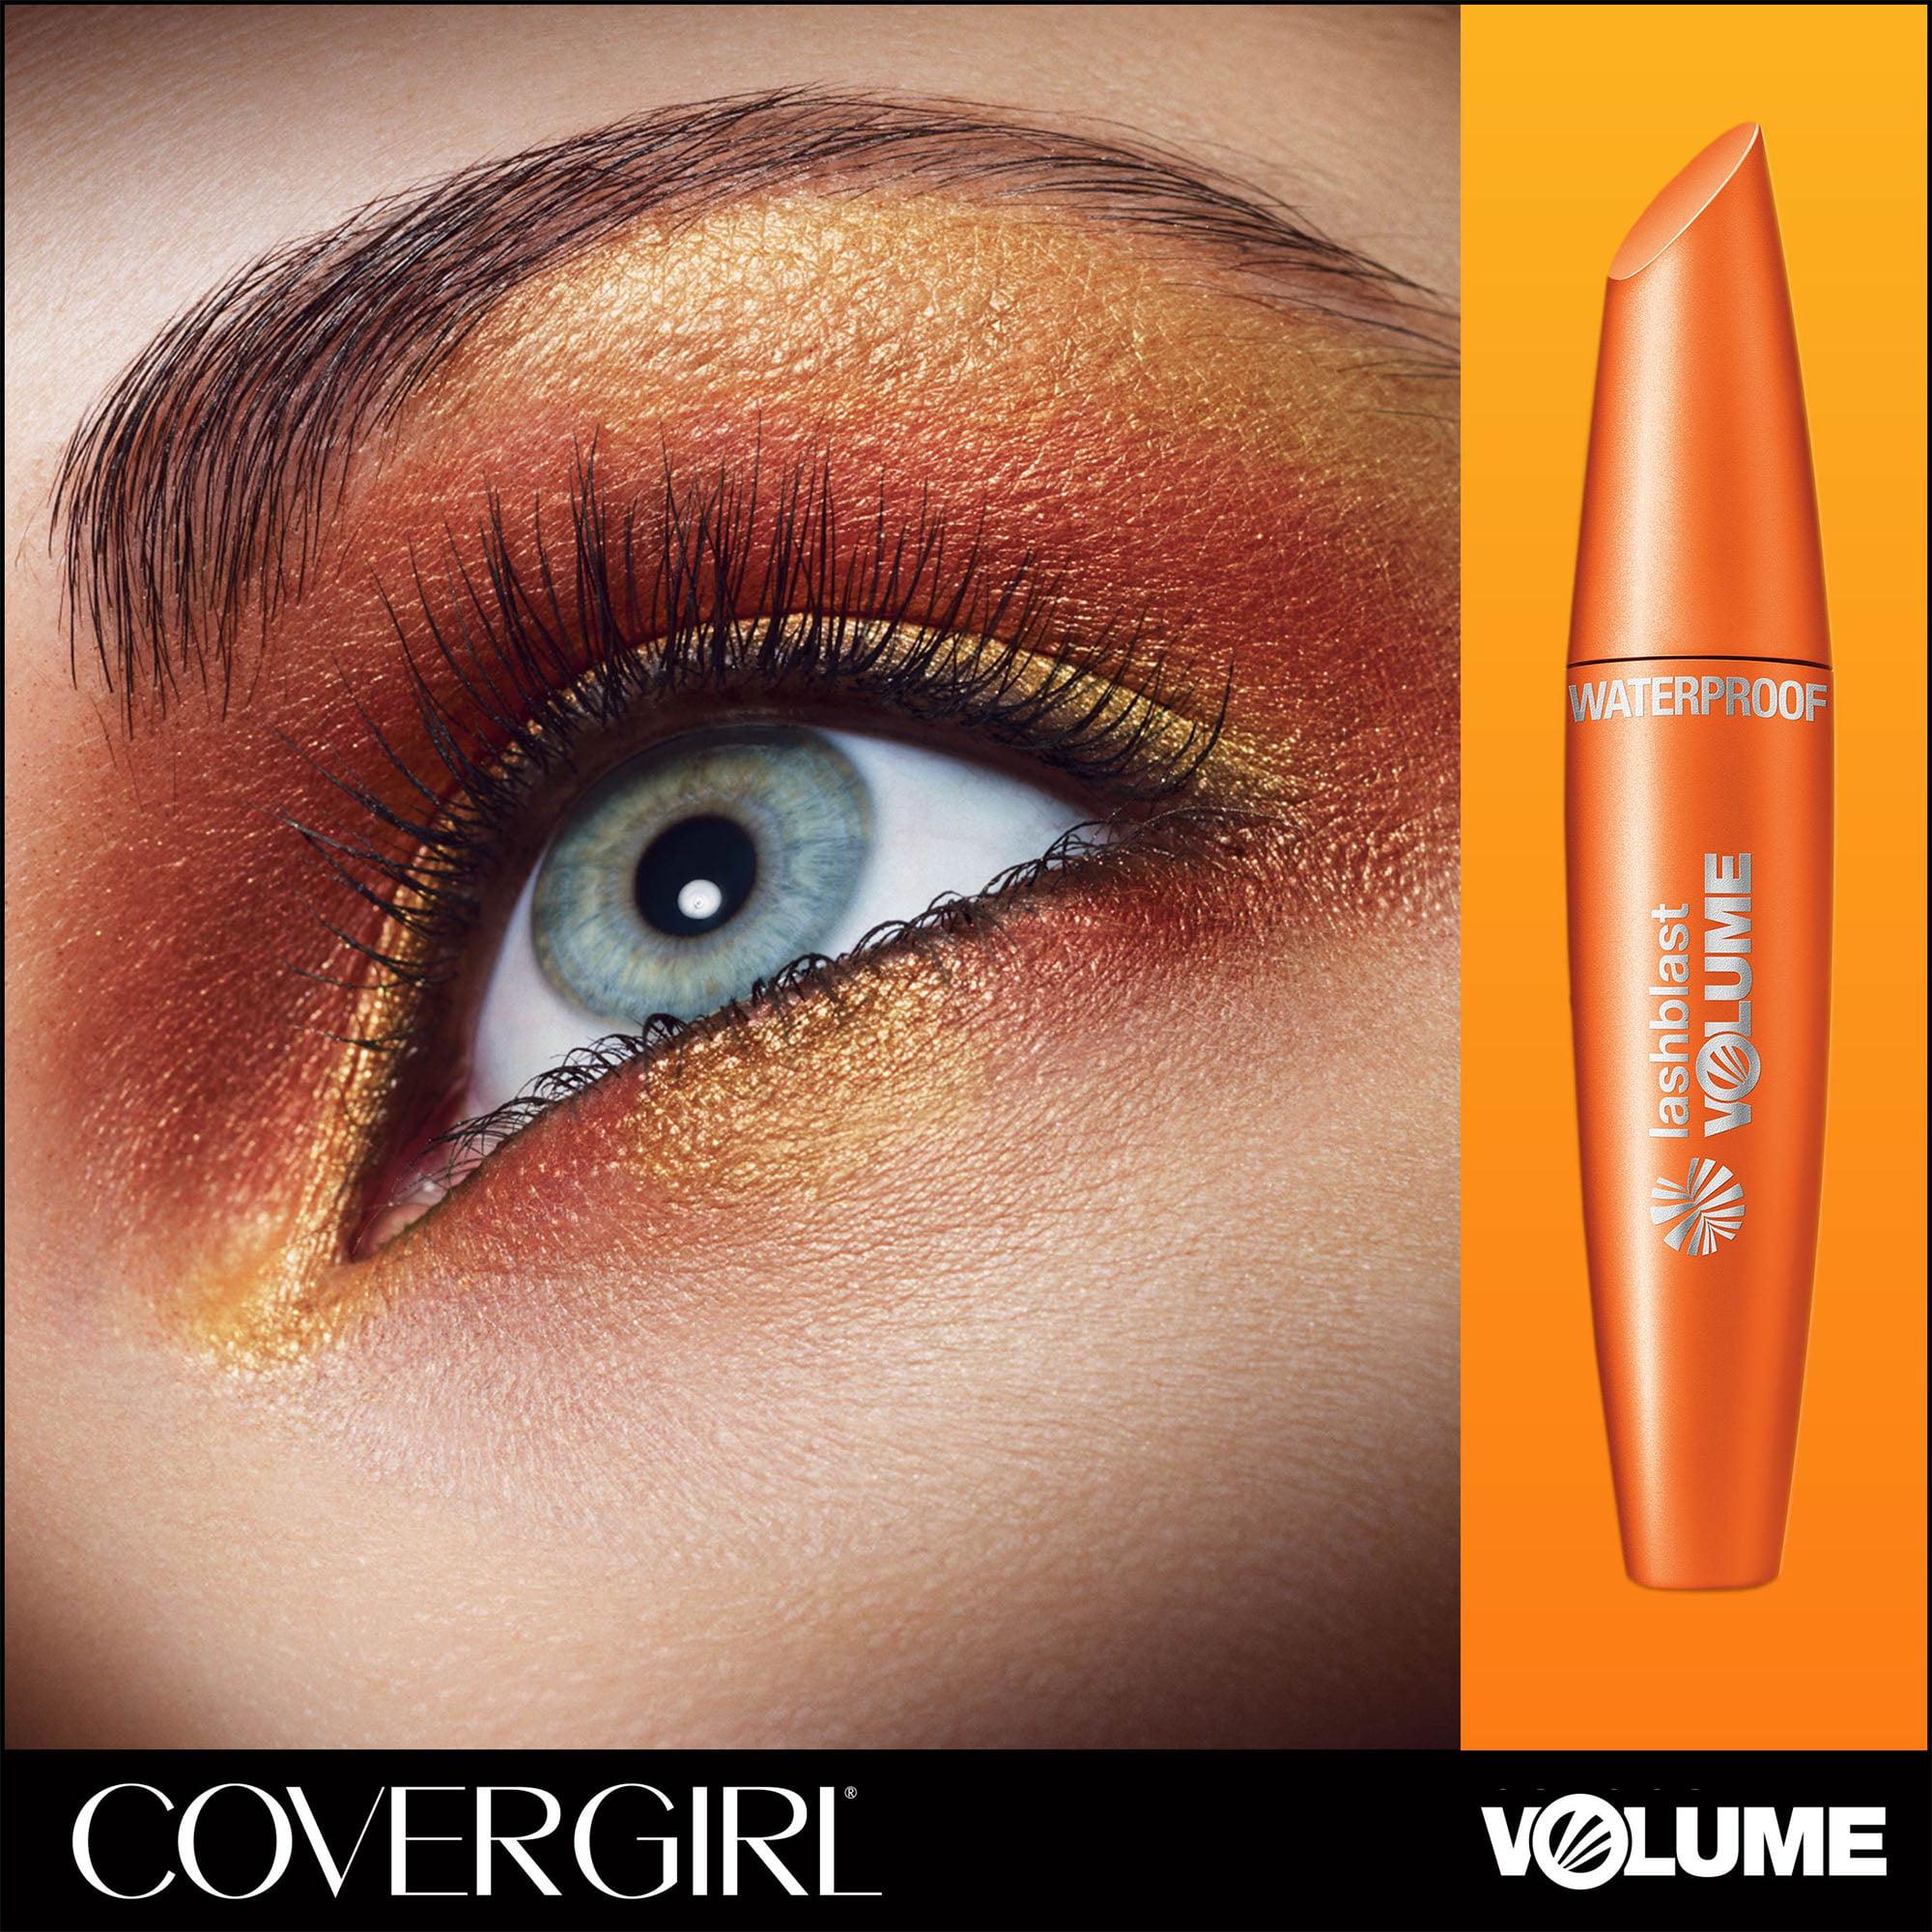 LashBlast Volume Mascara by Covergirl #7